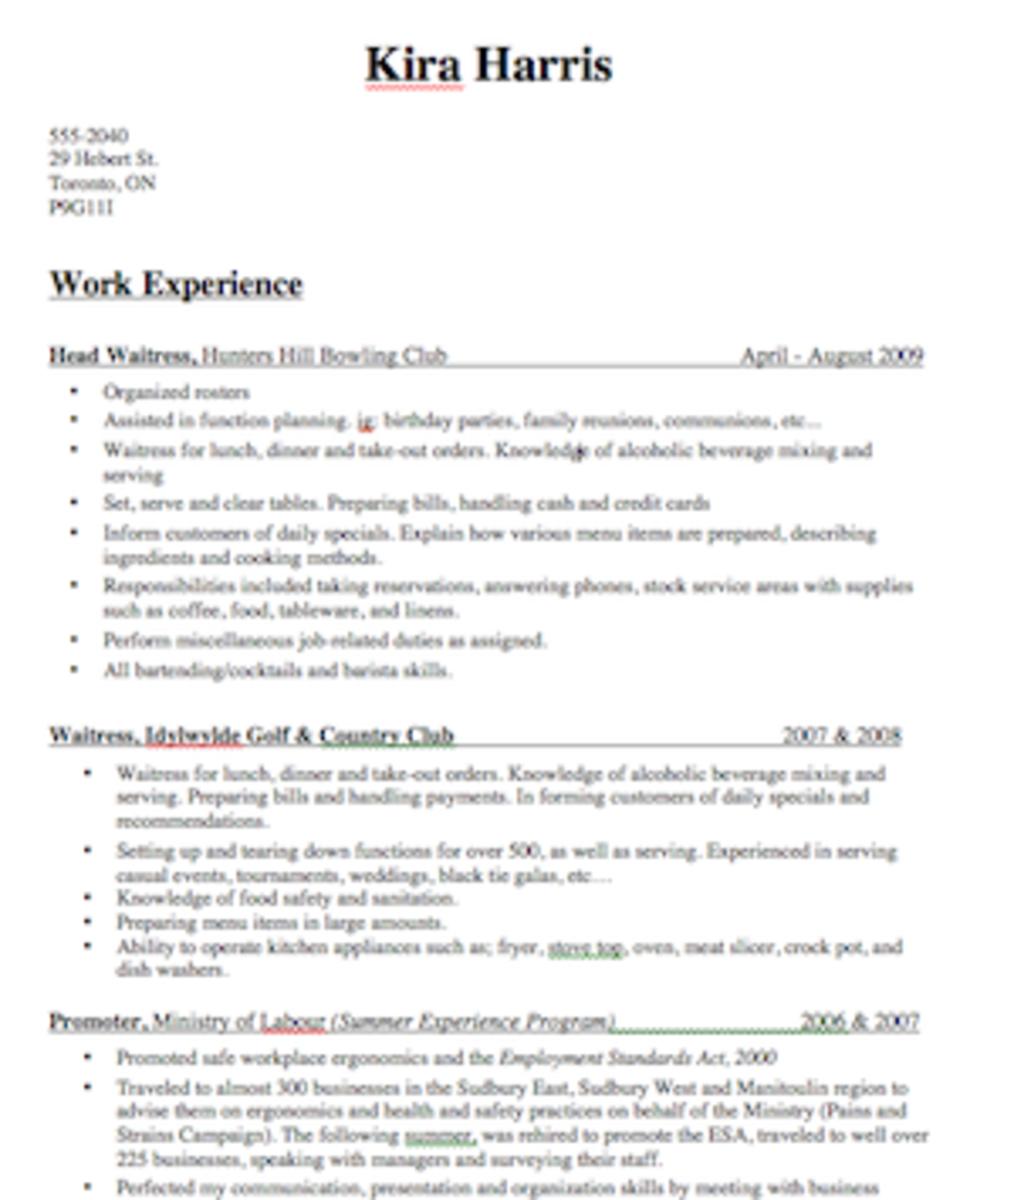 bartender resume samples - Bartender Resume Samples